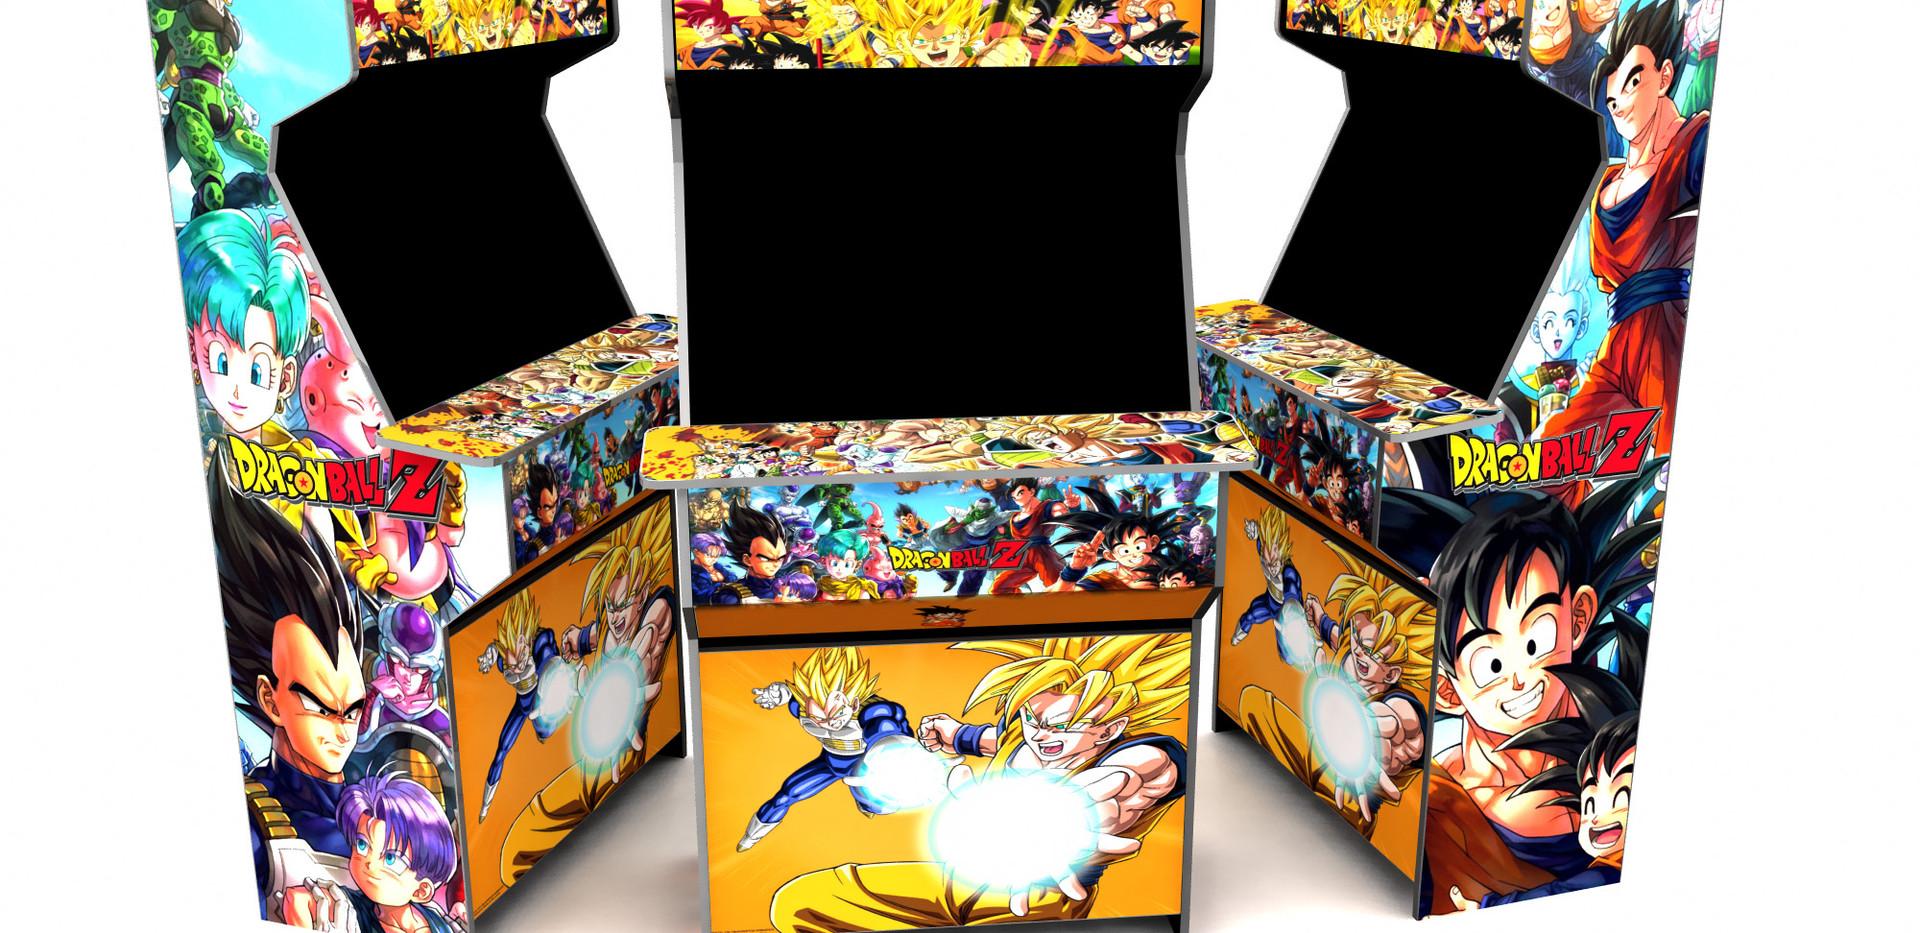 DragonBall Z Arcade